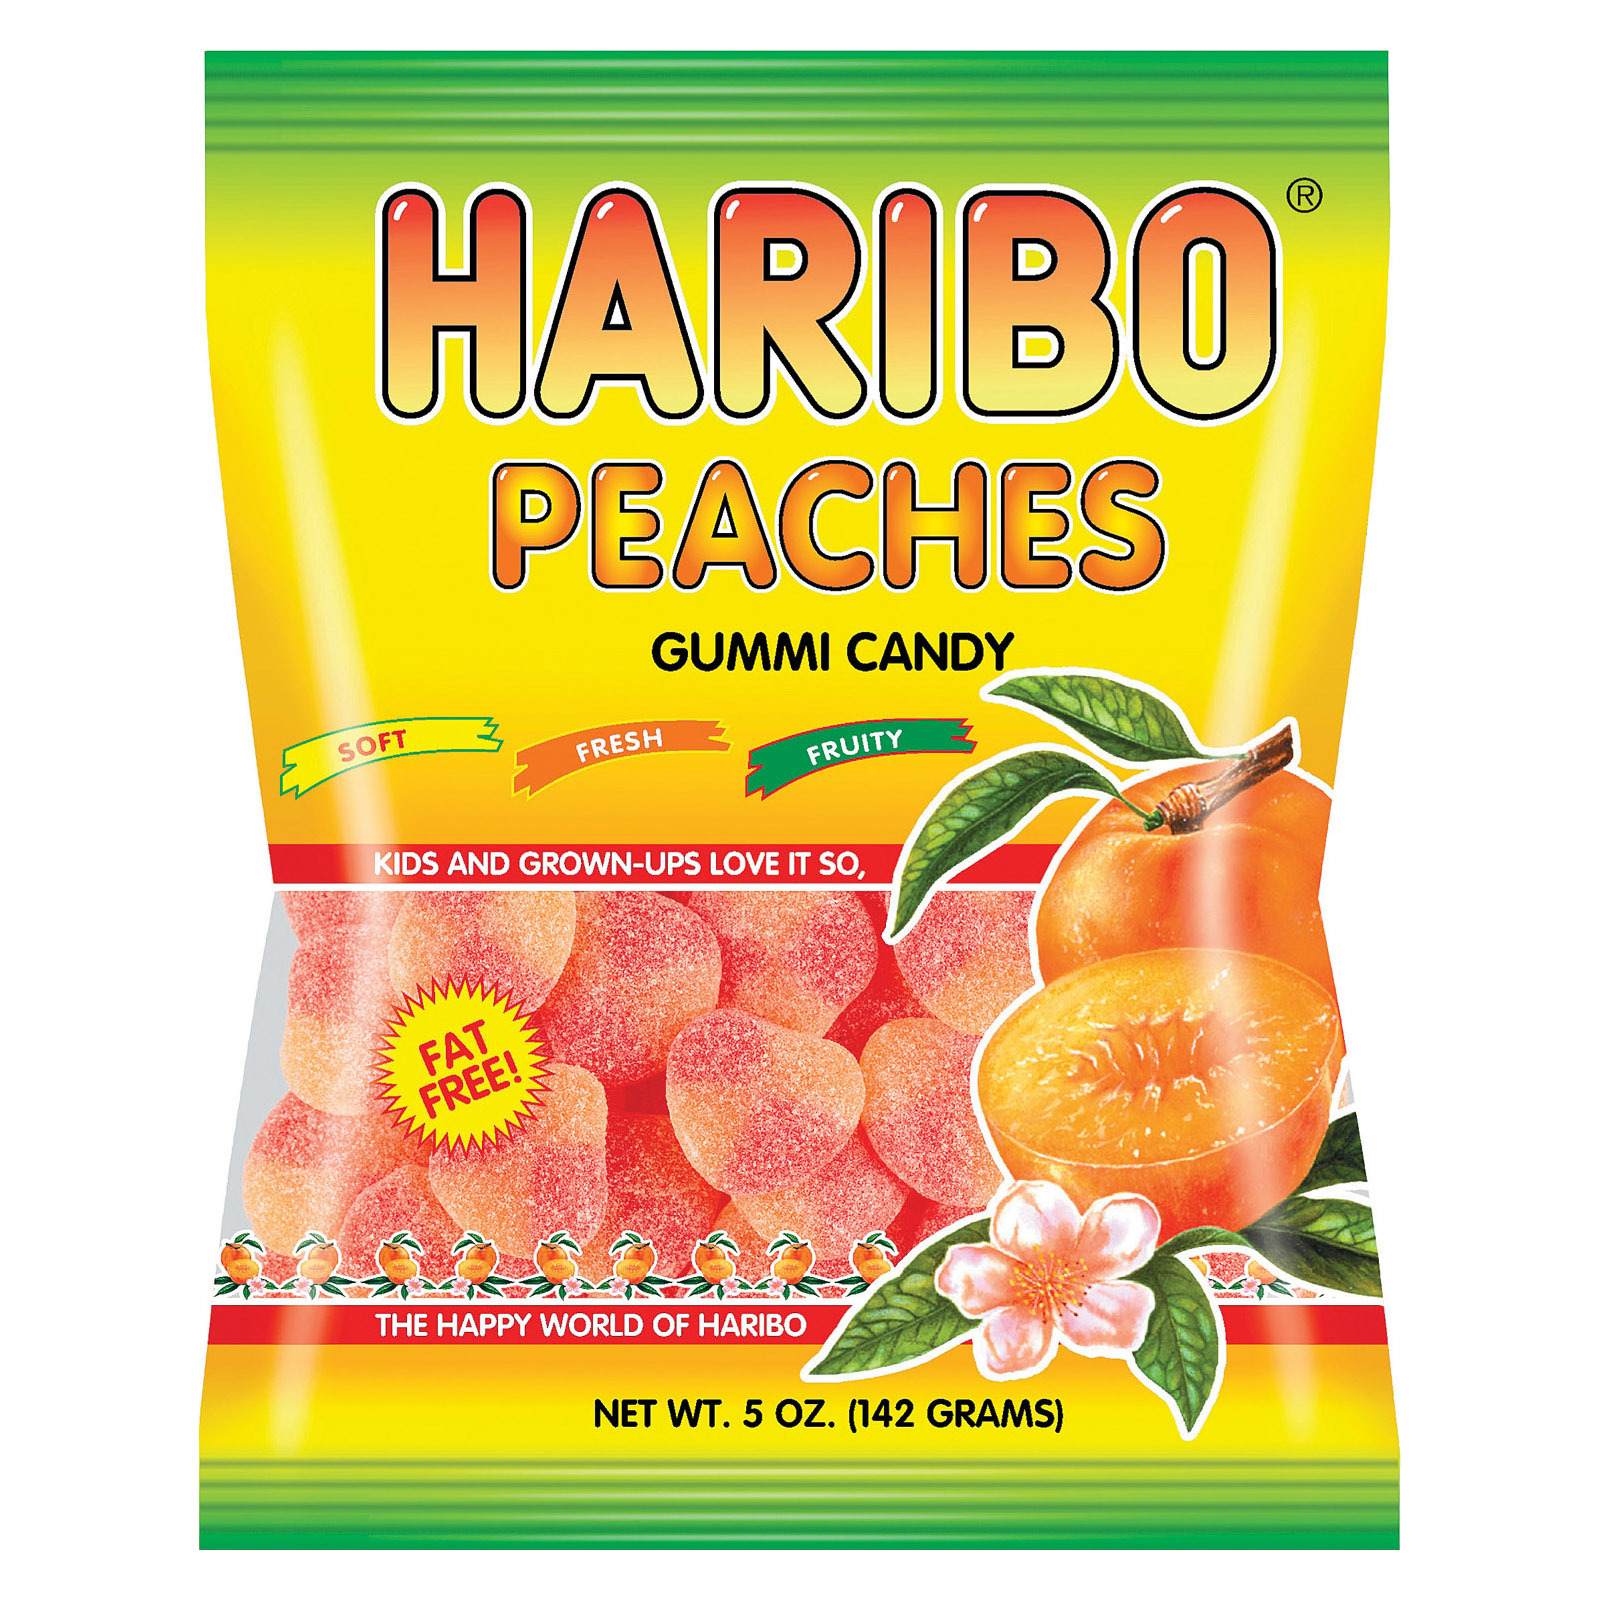 Haribo Peaches - Natural - Case of 12 - 5 oz.